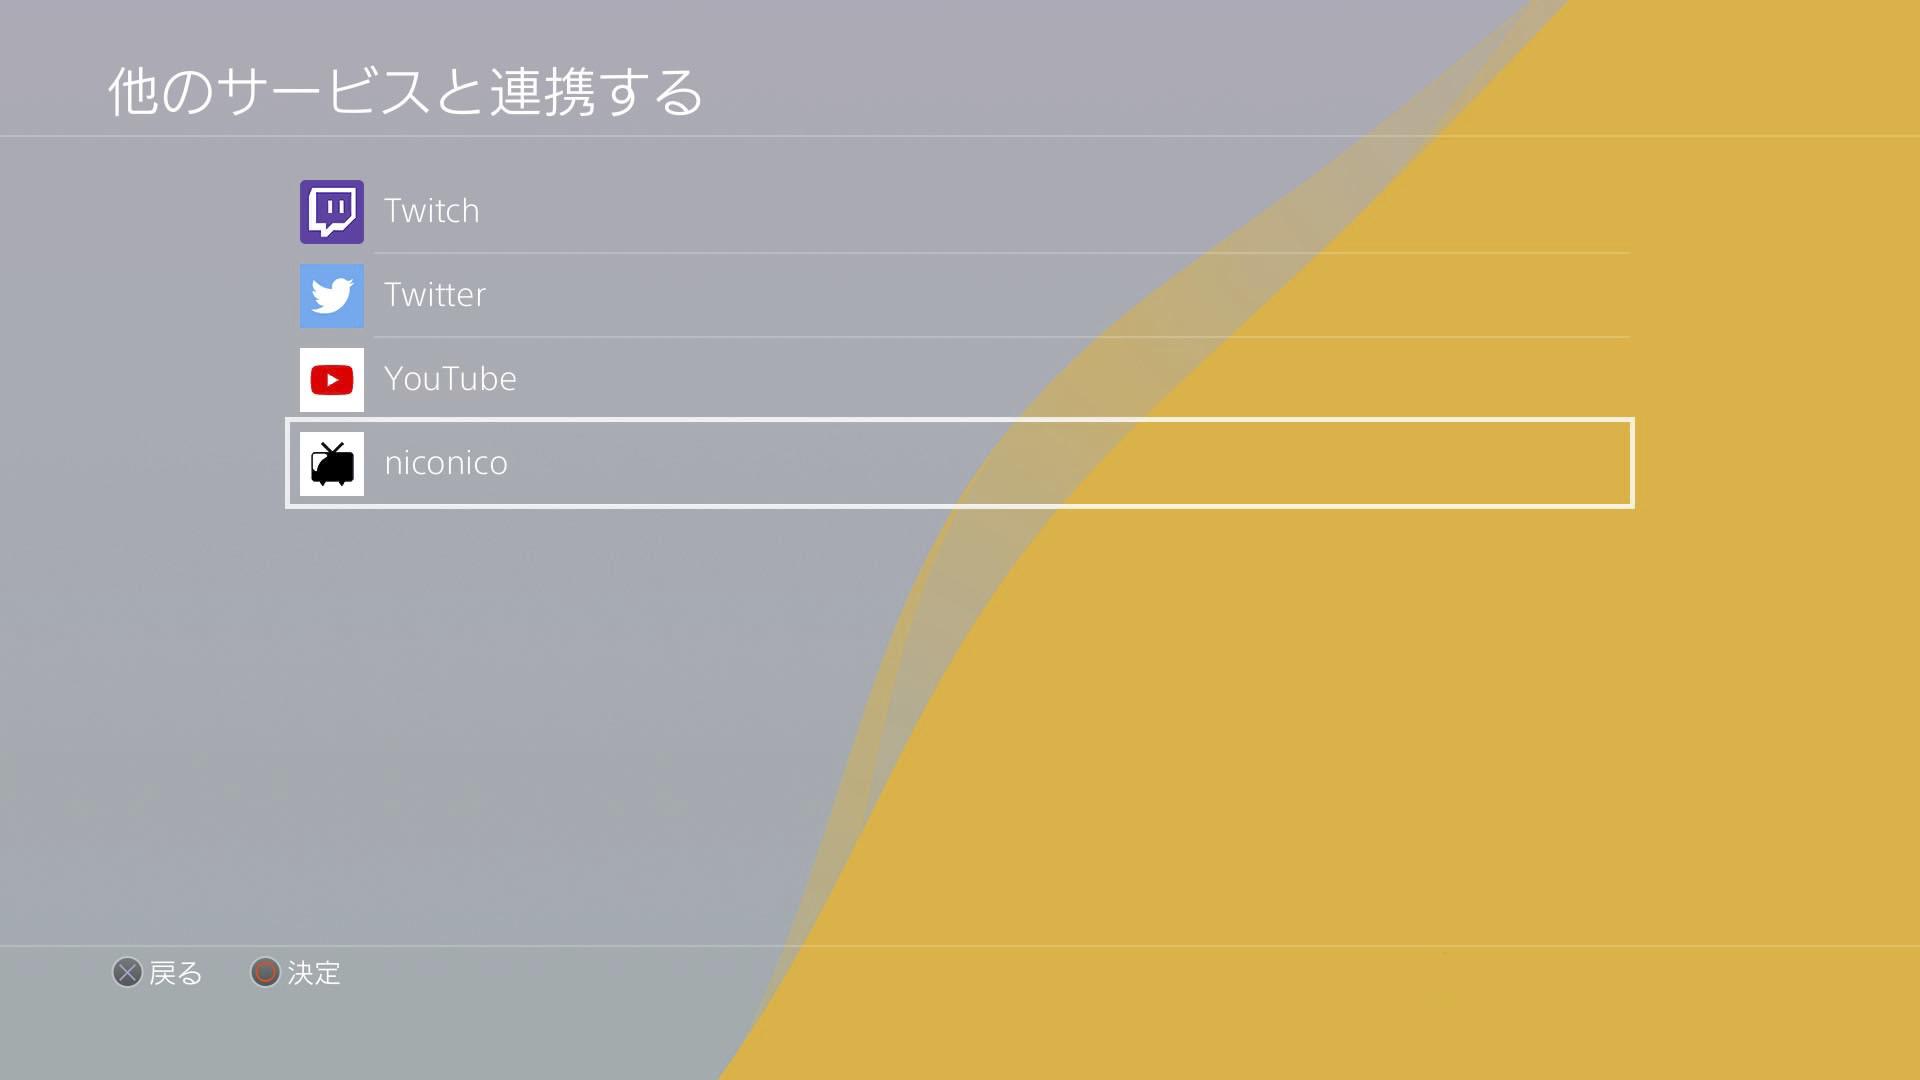 niconico-screenshot-02-ja-jp-29jan21.png